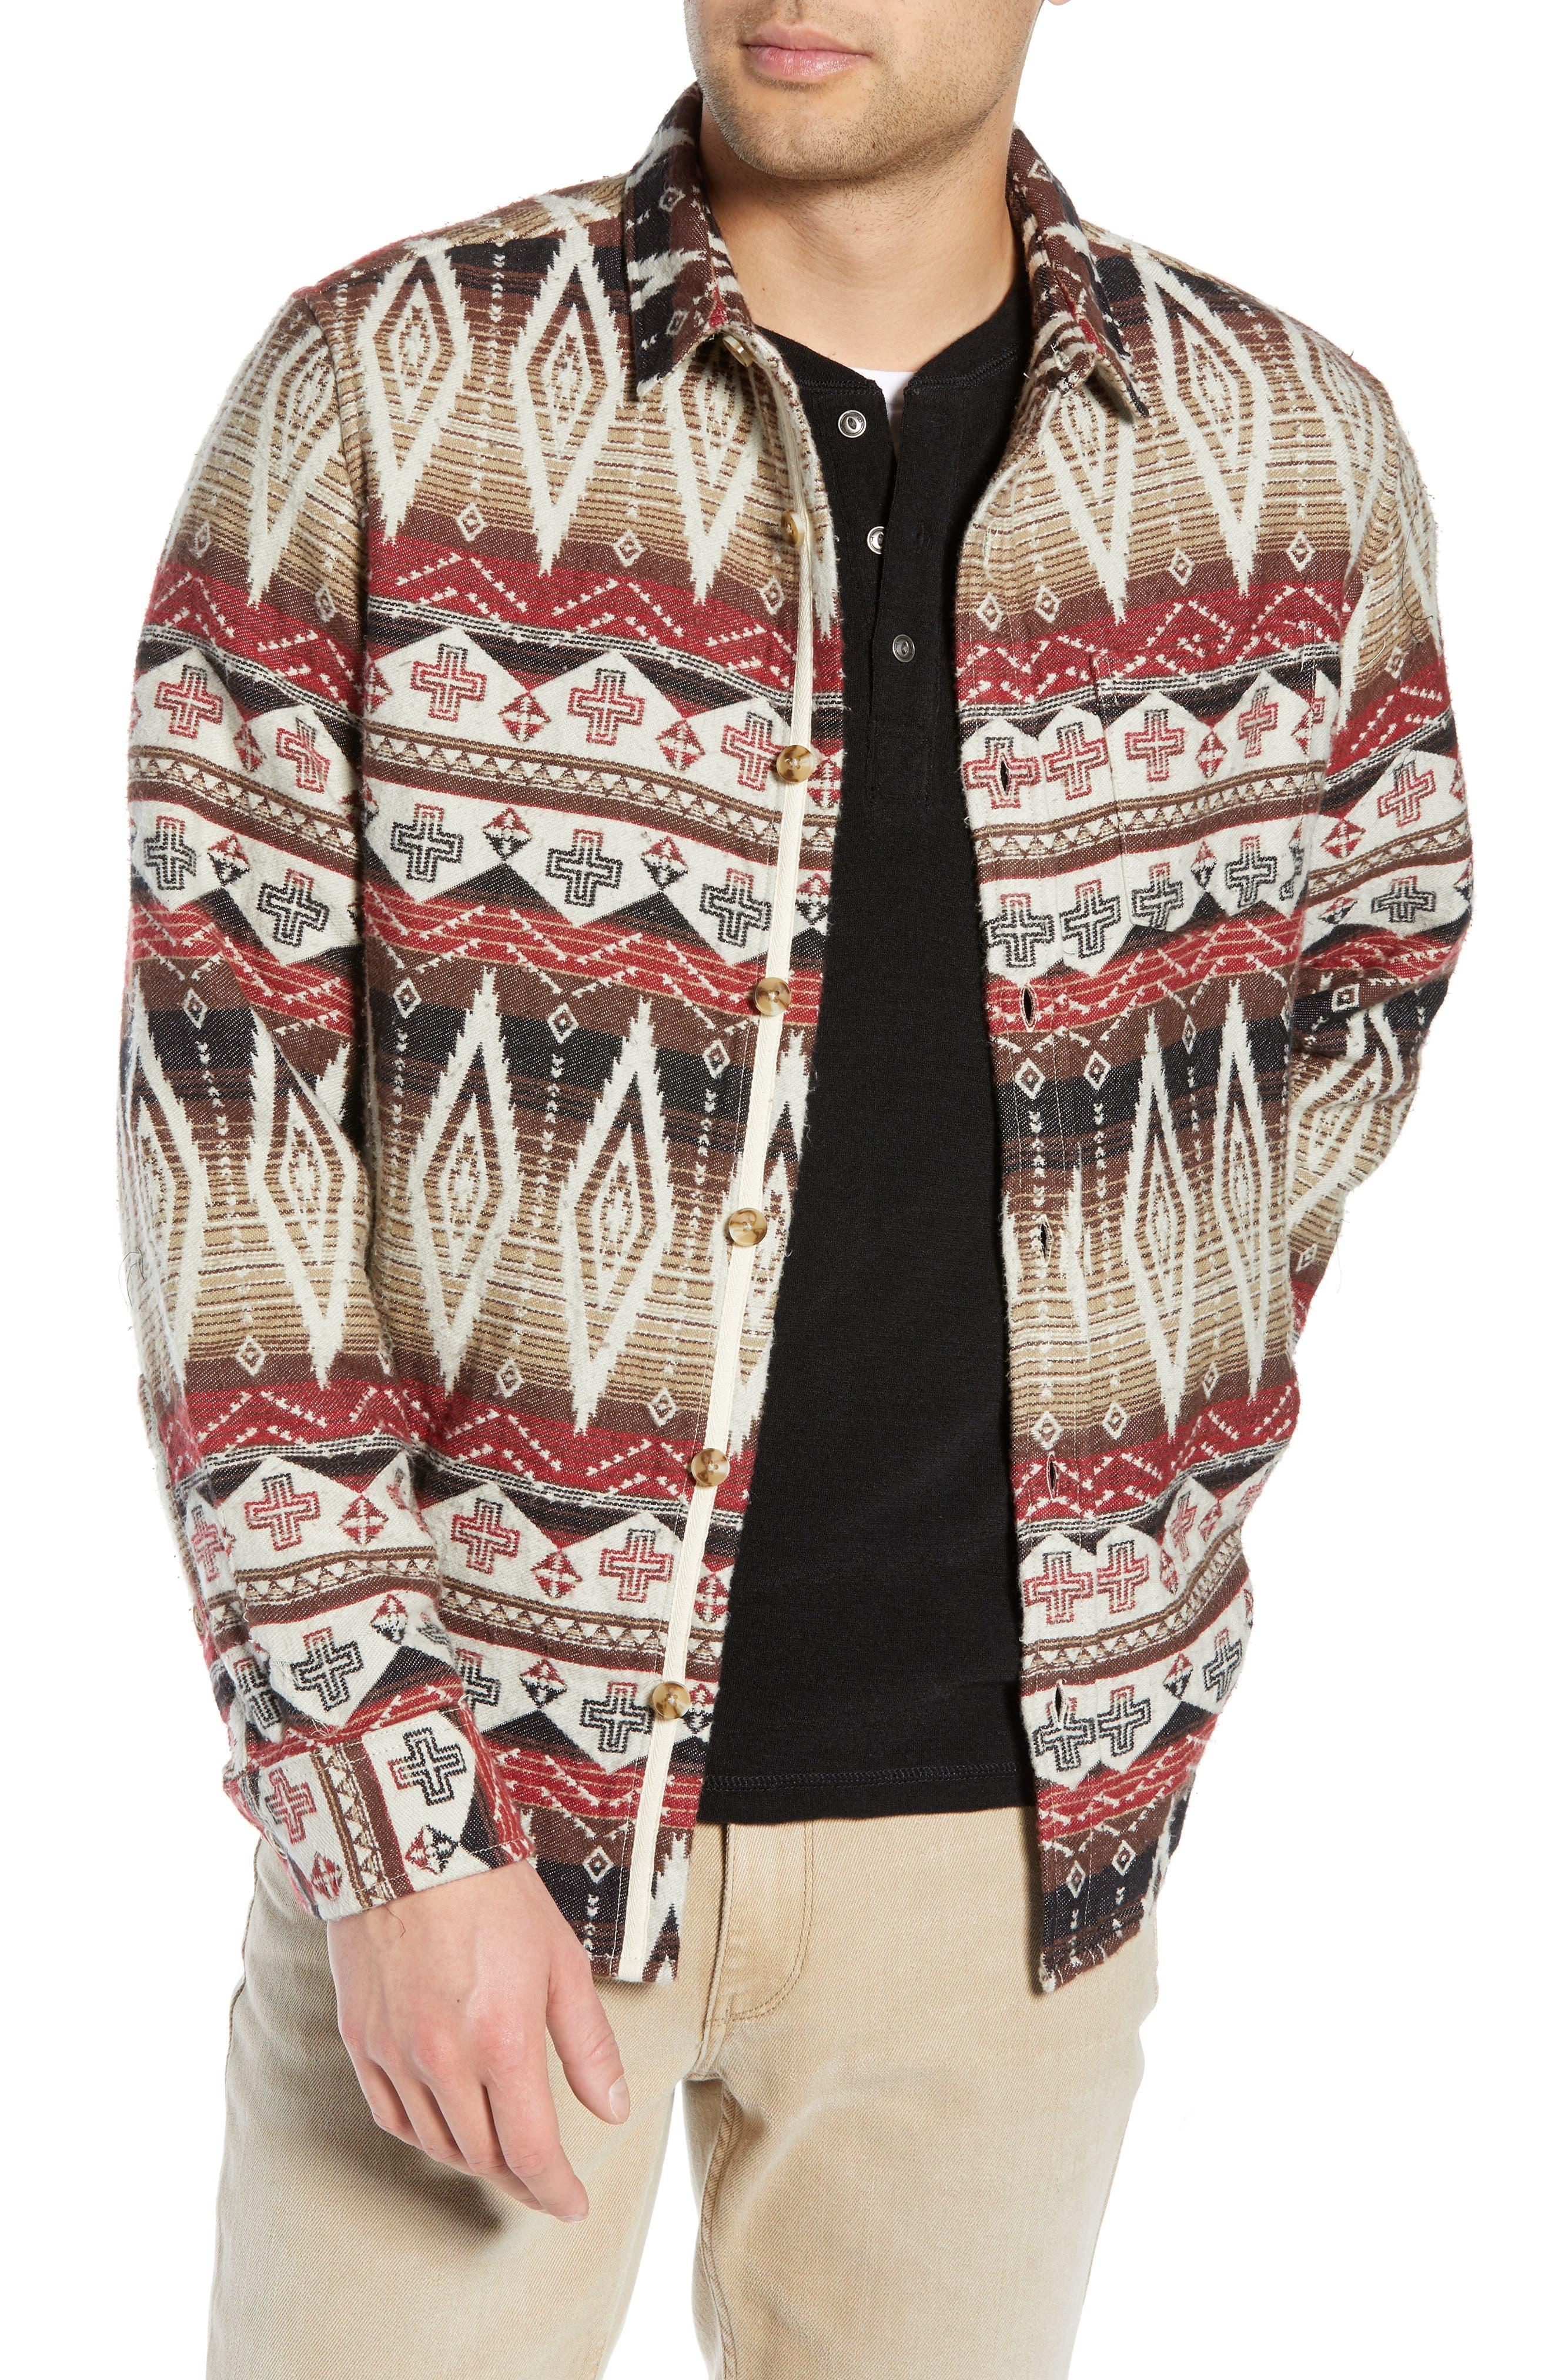 Geo Blanket Shirt Jacket,                             Main thumbnail 1, color,                             BEIGE RAINY DAY TRIBAL PRINT